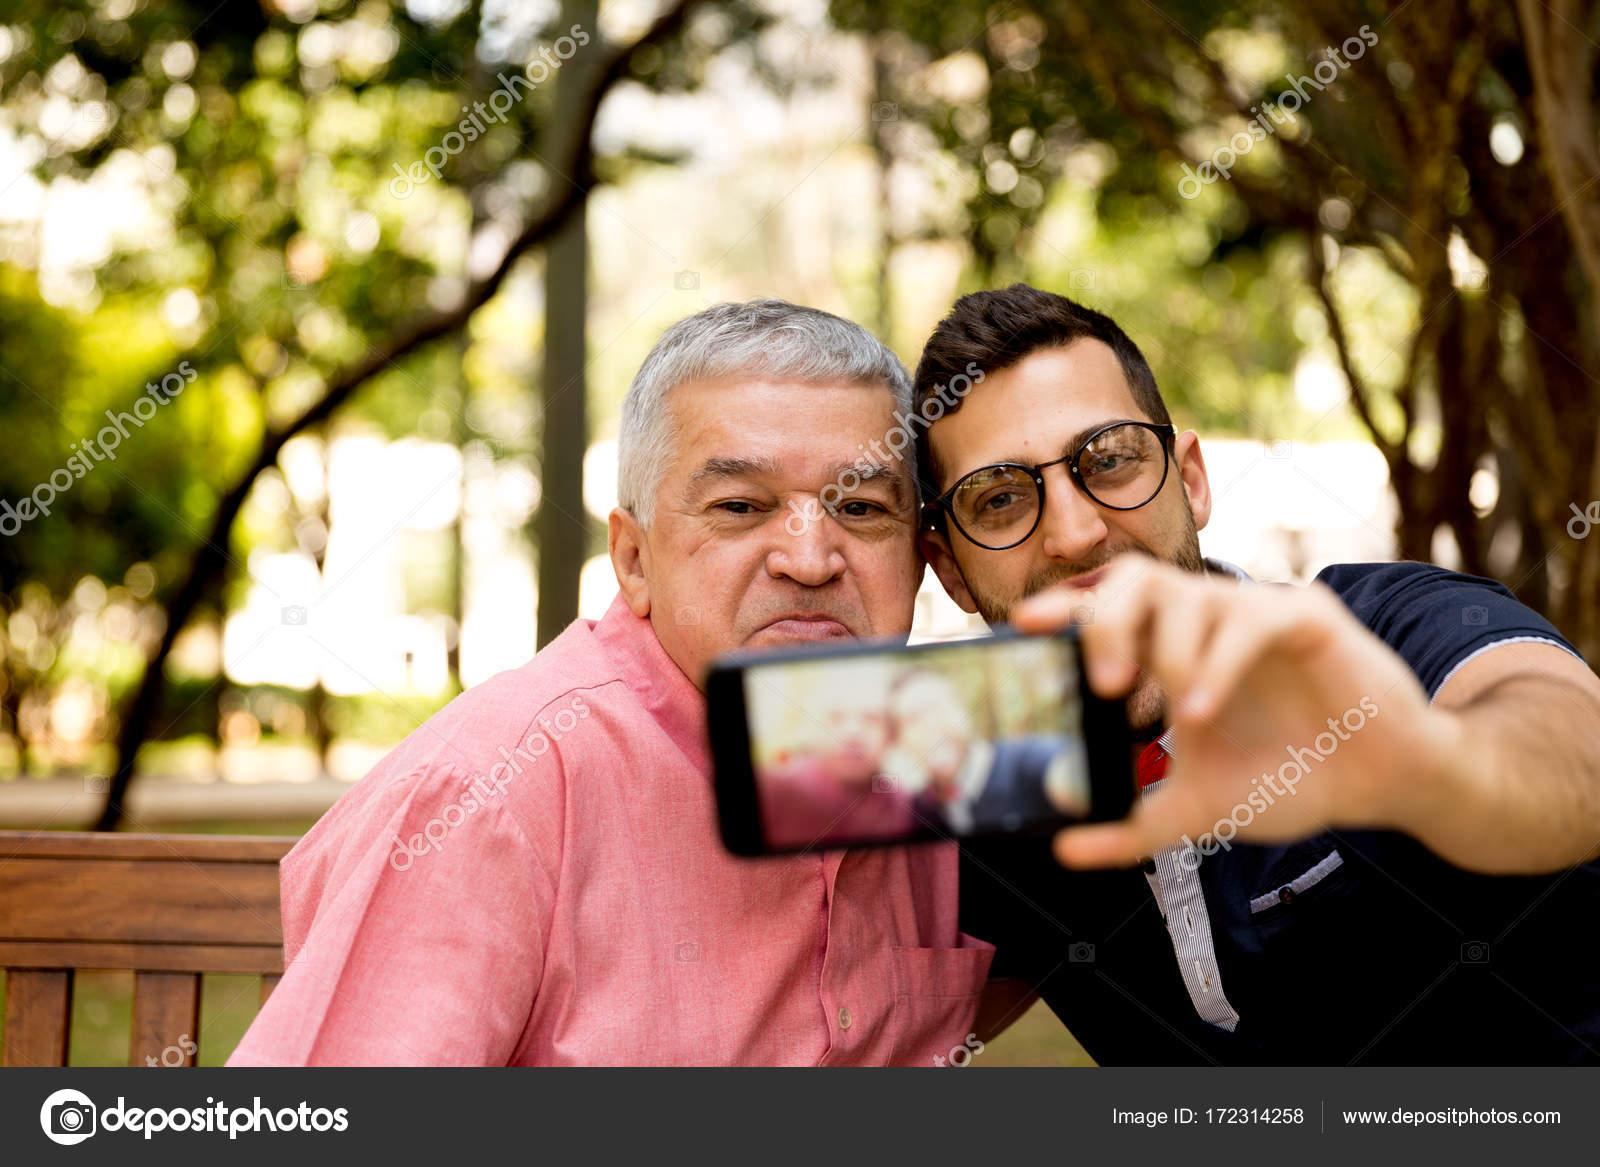 Padre E Hijo Tomando Selfie Y